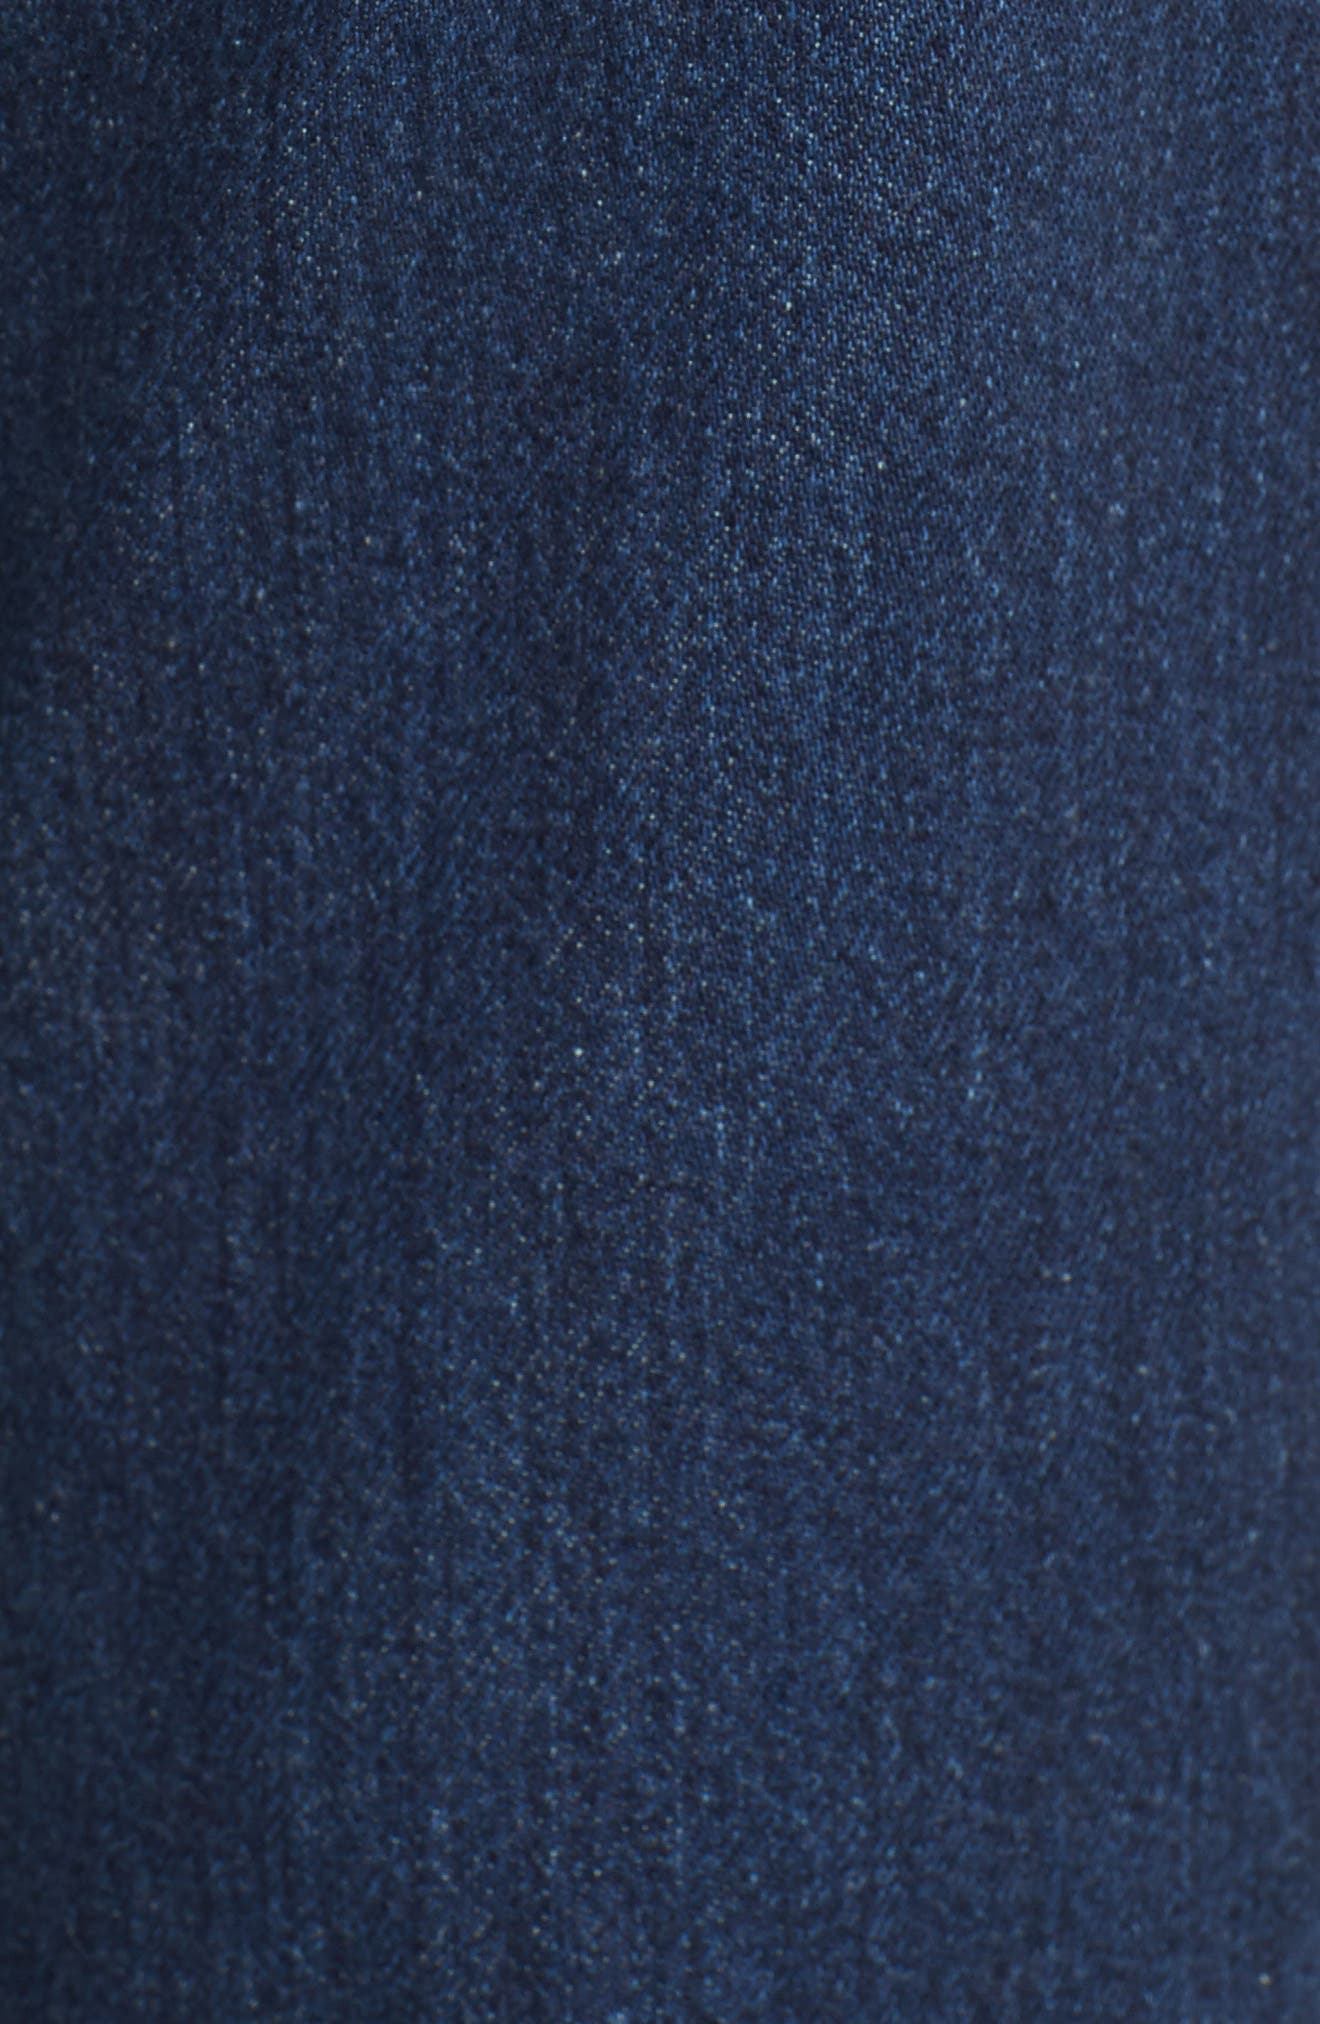 Marques'Almeida Button Trim Crop Flare Jeans,                             Alternate thumbnail 6, color,                             Indigo